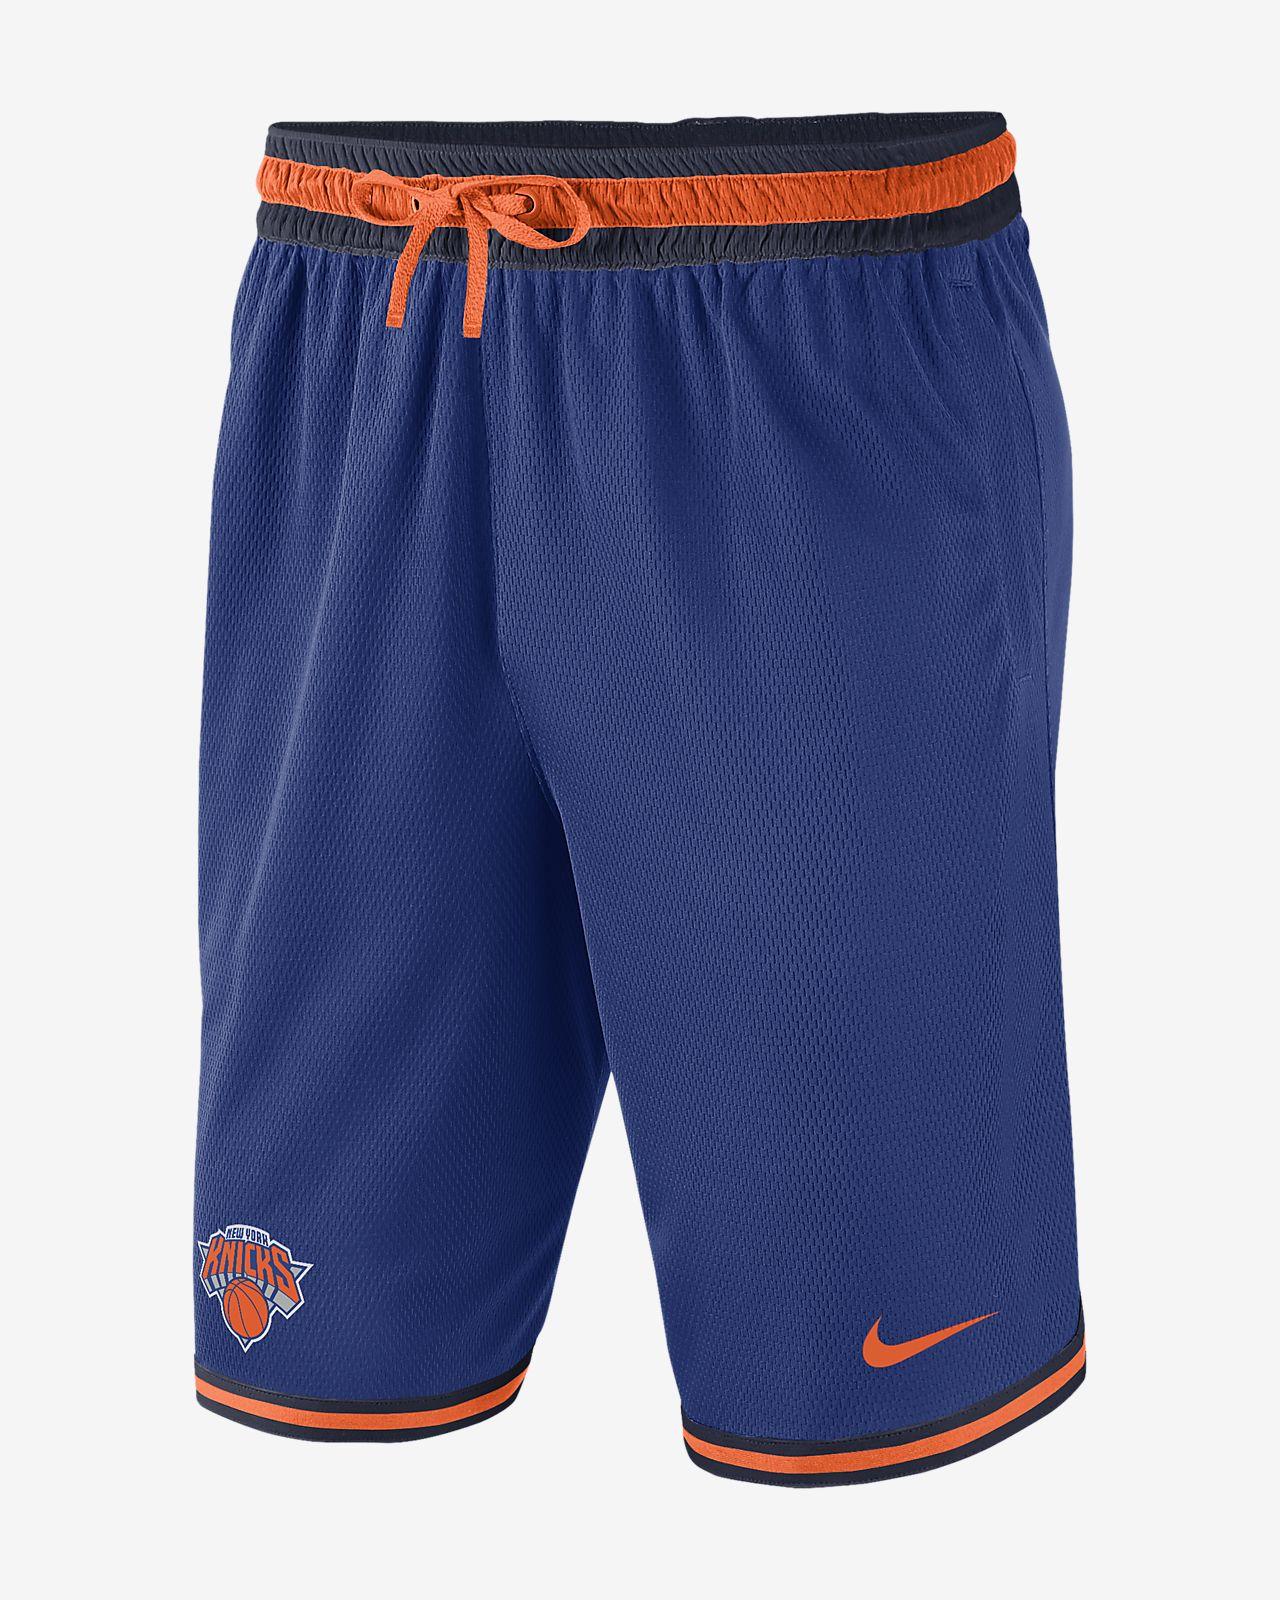 Short NBA New York Knicks Nike pour Homme